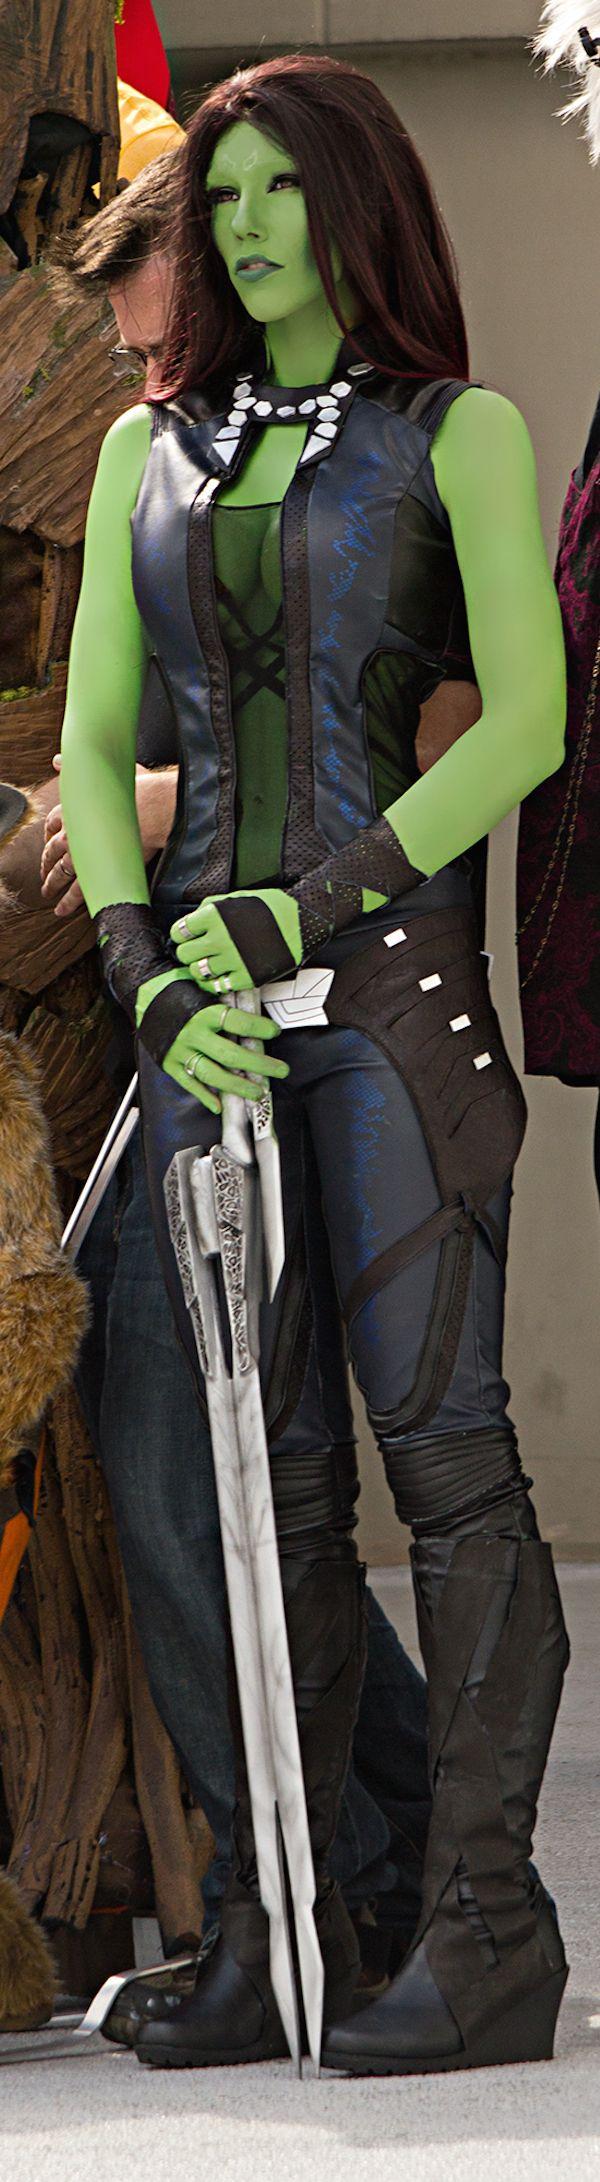 Gamora par Caitlin Rhyne - Dragoncon 2014 #CaitlinRhyne #Gamora #Comics…